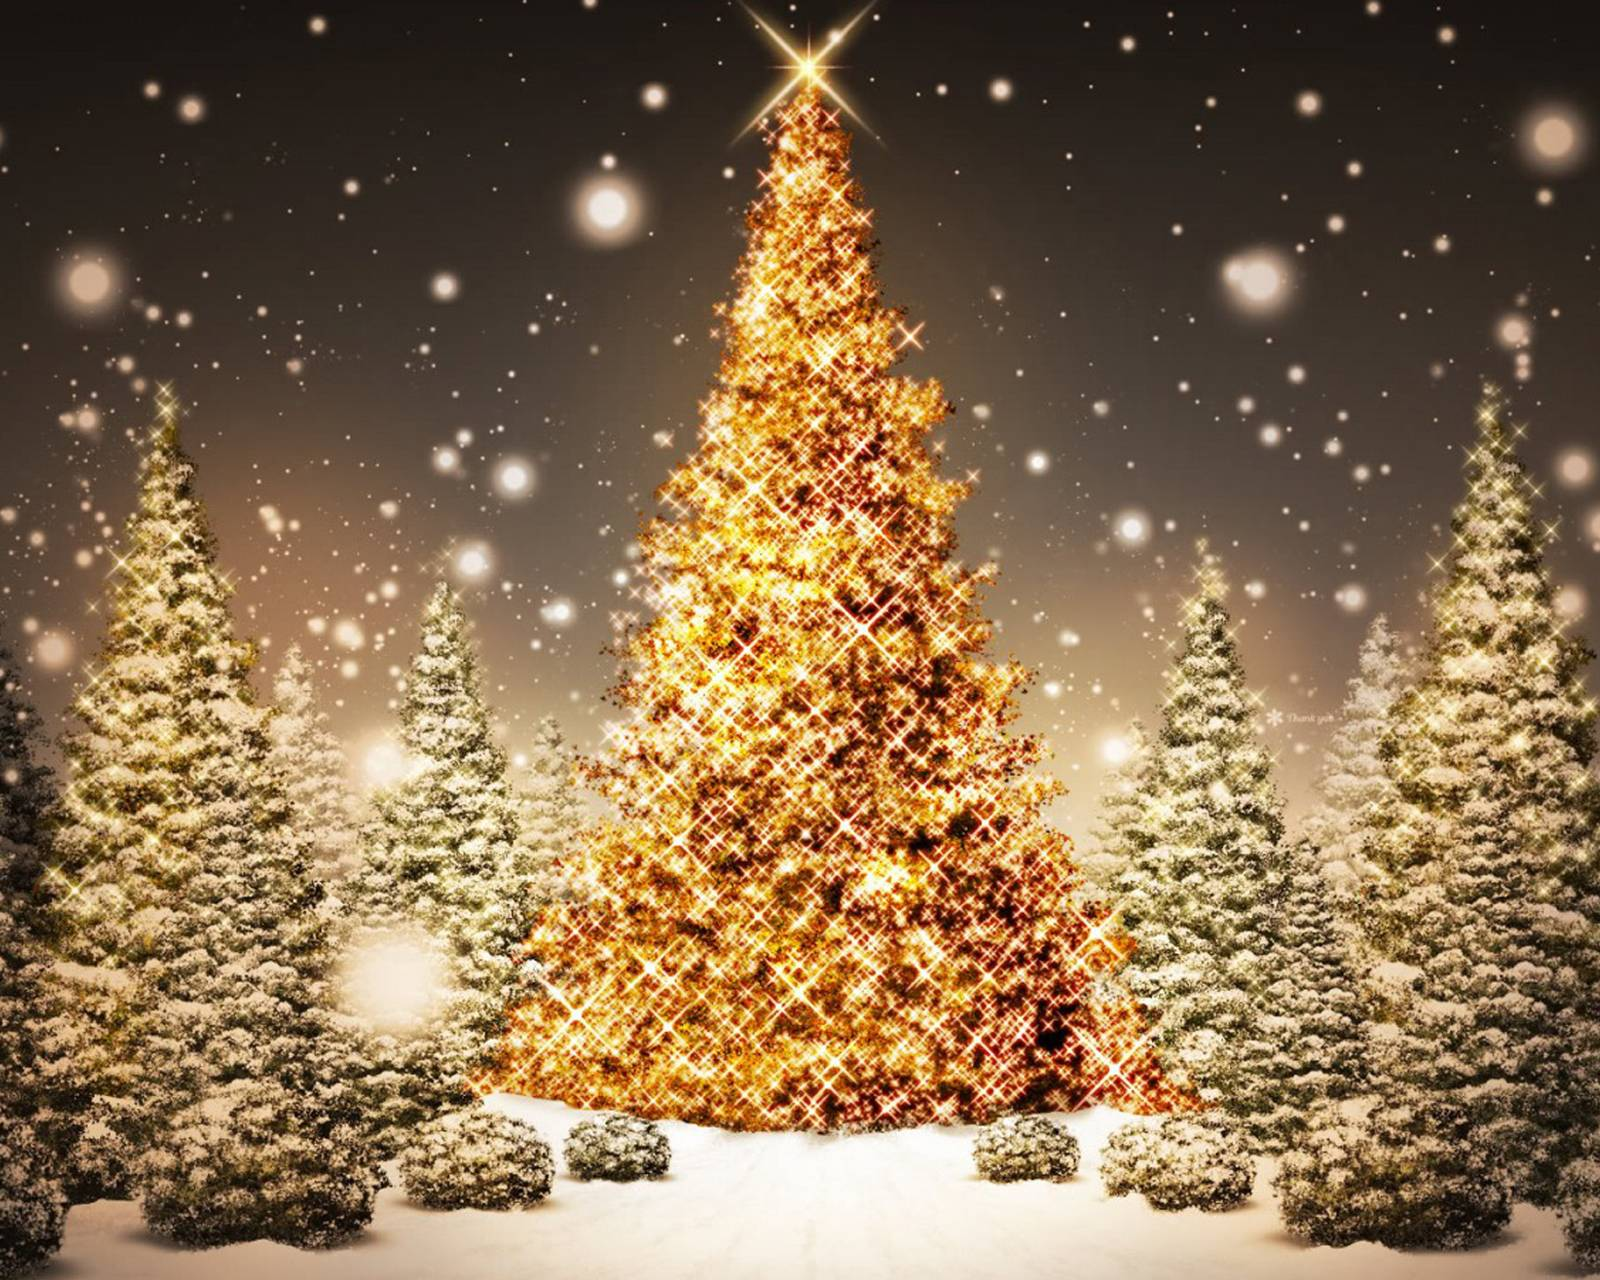 Xmas Tree And Lights